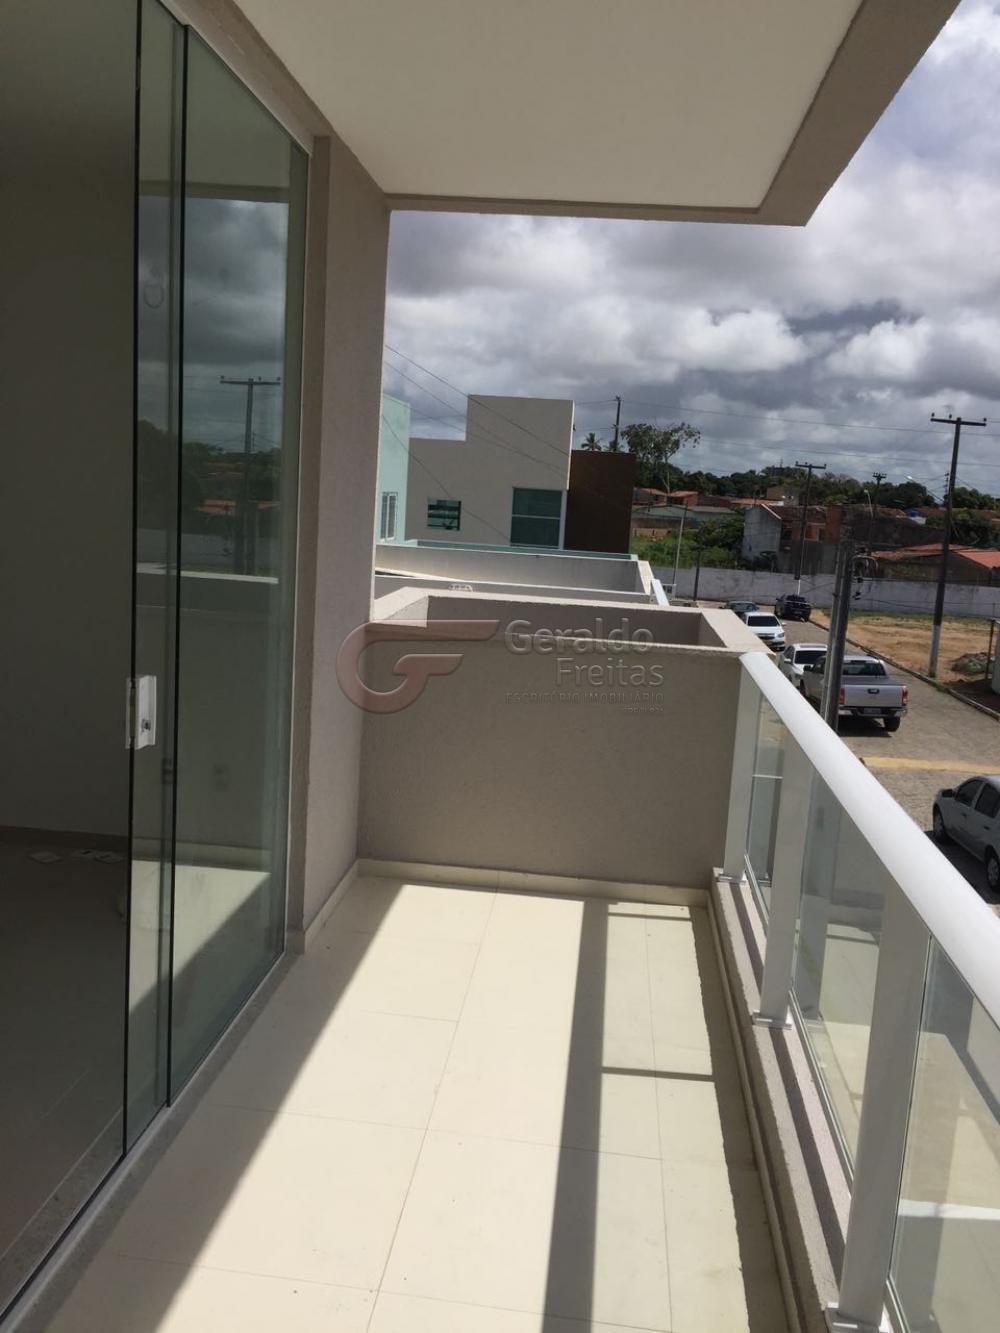 Comprar Casas / Condominio em Maceió apenas R$ 580.000,00 - Foto 14